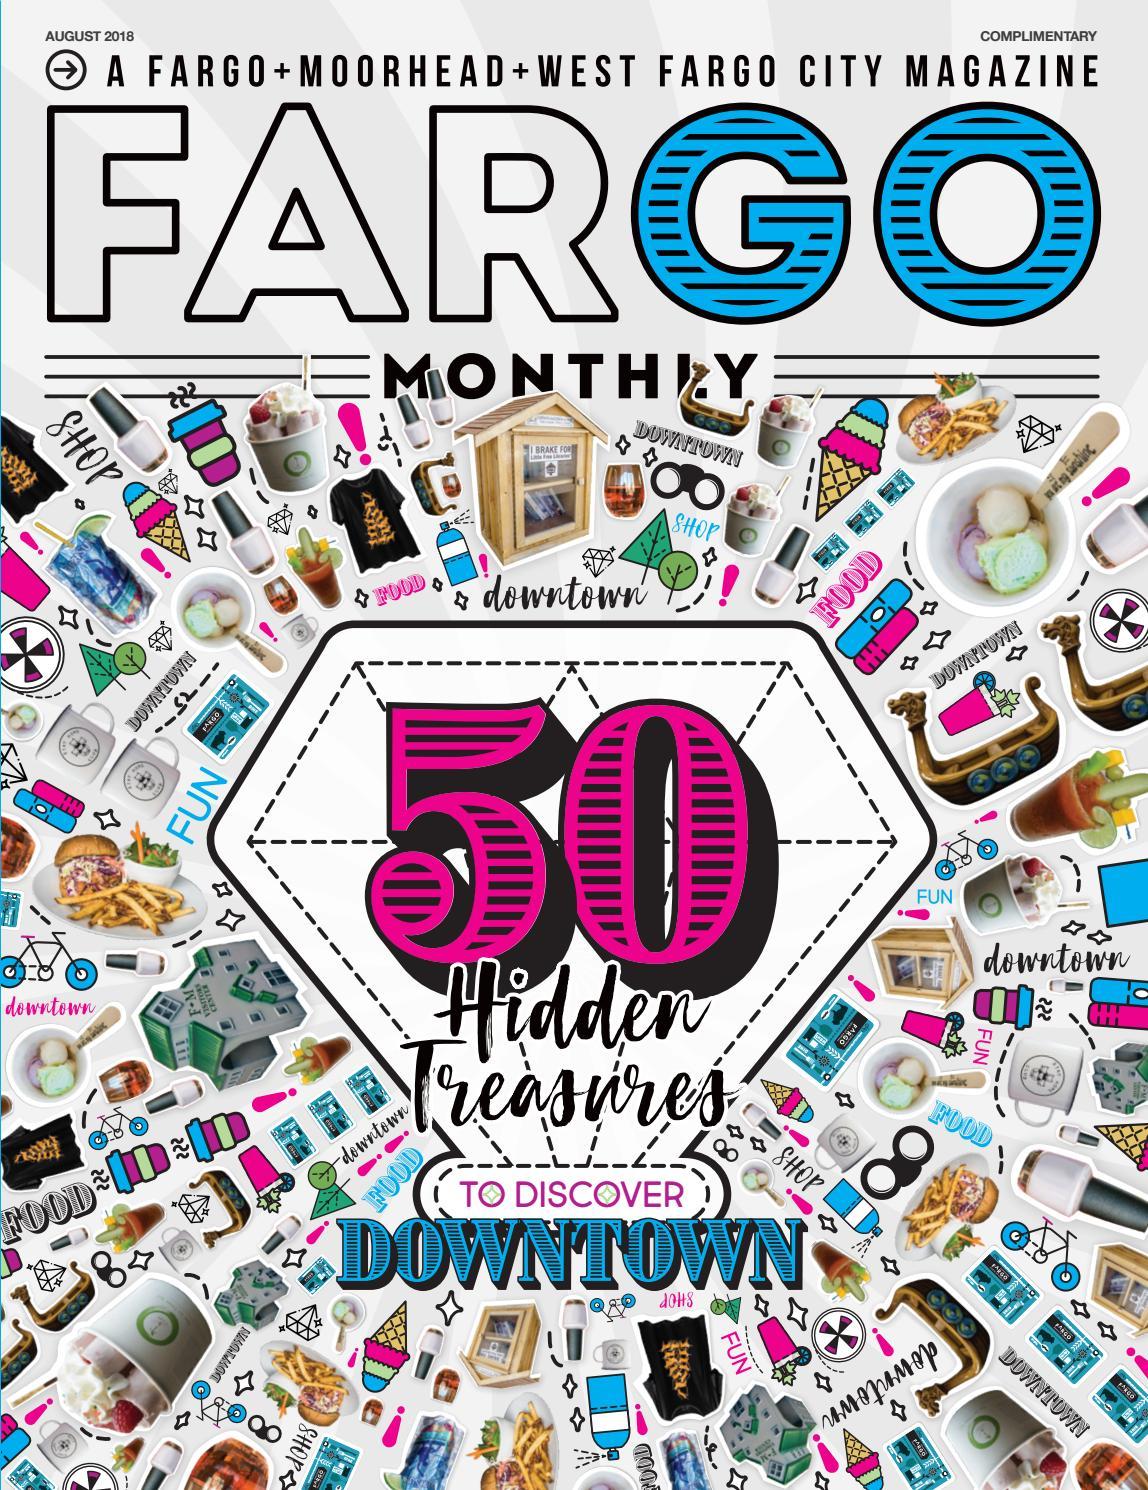 108fbea4014a Fargo Monthly August 2018 by Spotlight Media - issuu